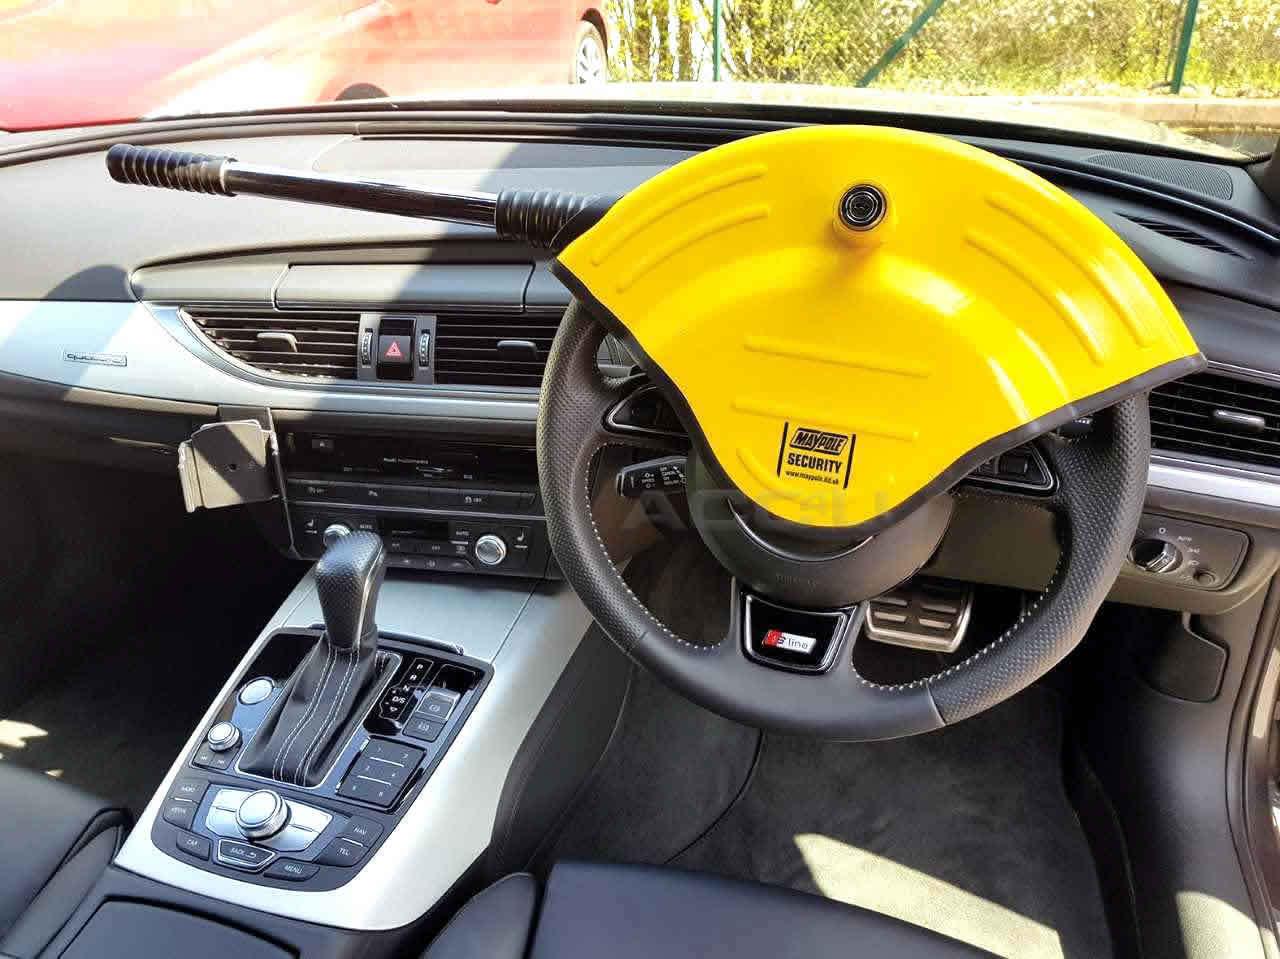 Für Nissan Qashqai Auto Stoplock Robust Hohe Sicherheit Sichtbar Lenkrad Schloss